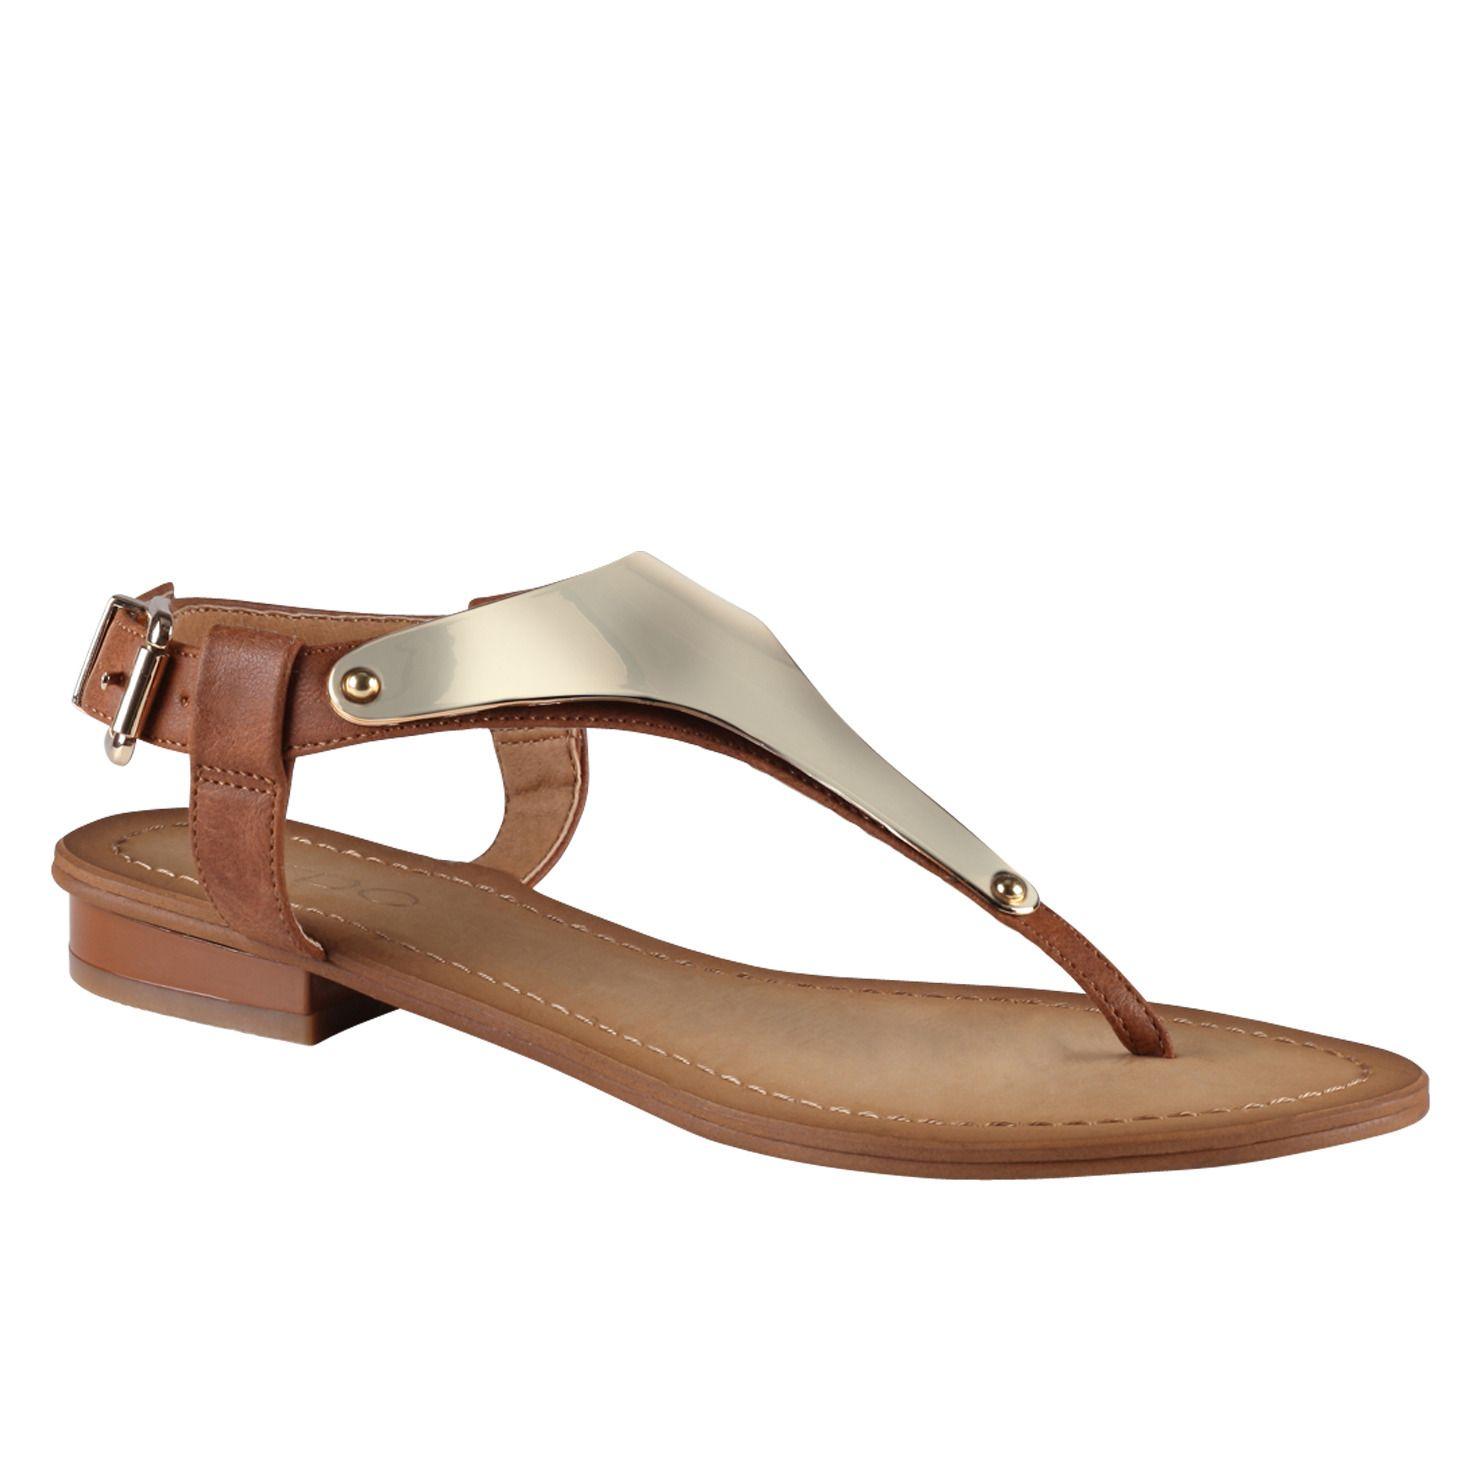 Sandals shoes sale - Labarbara Women S Flats Sandals For Sale At Aldo Shoes